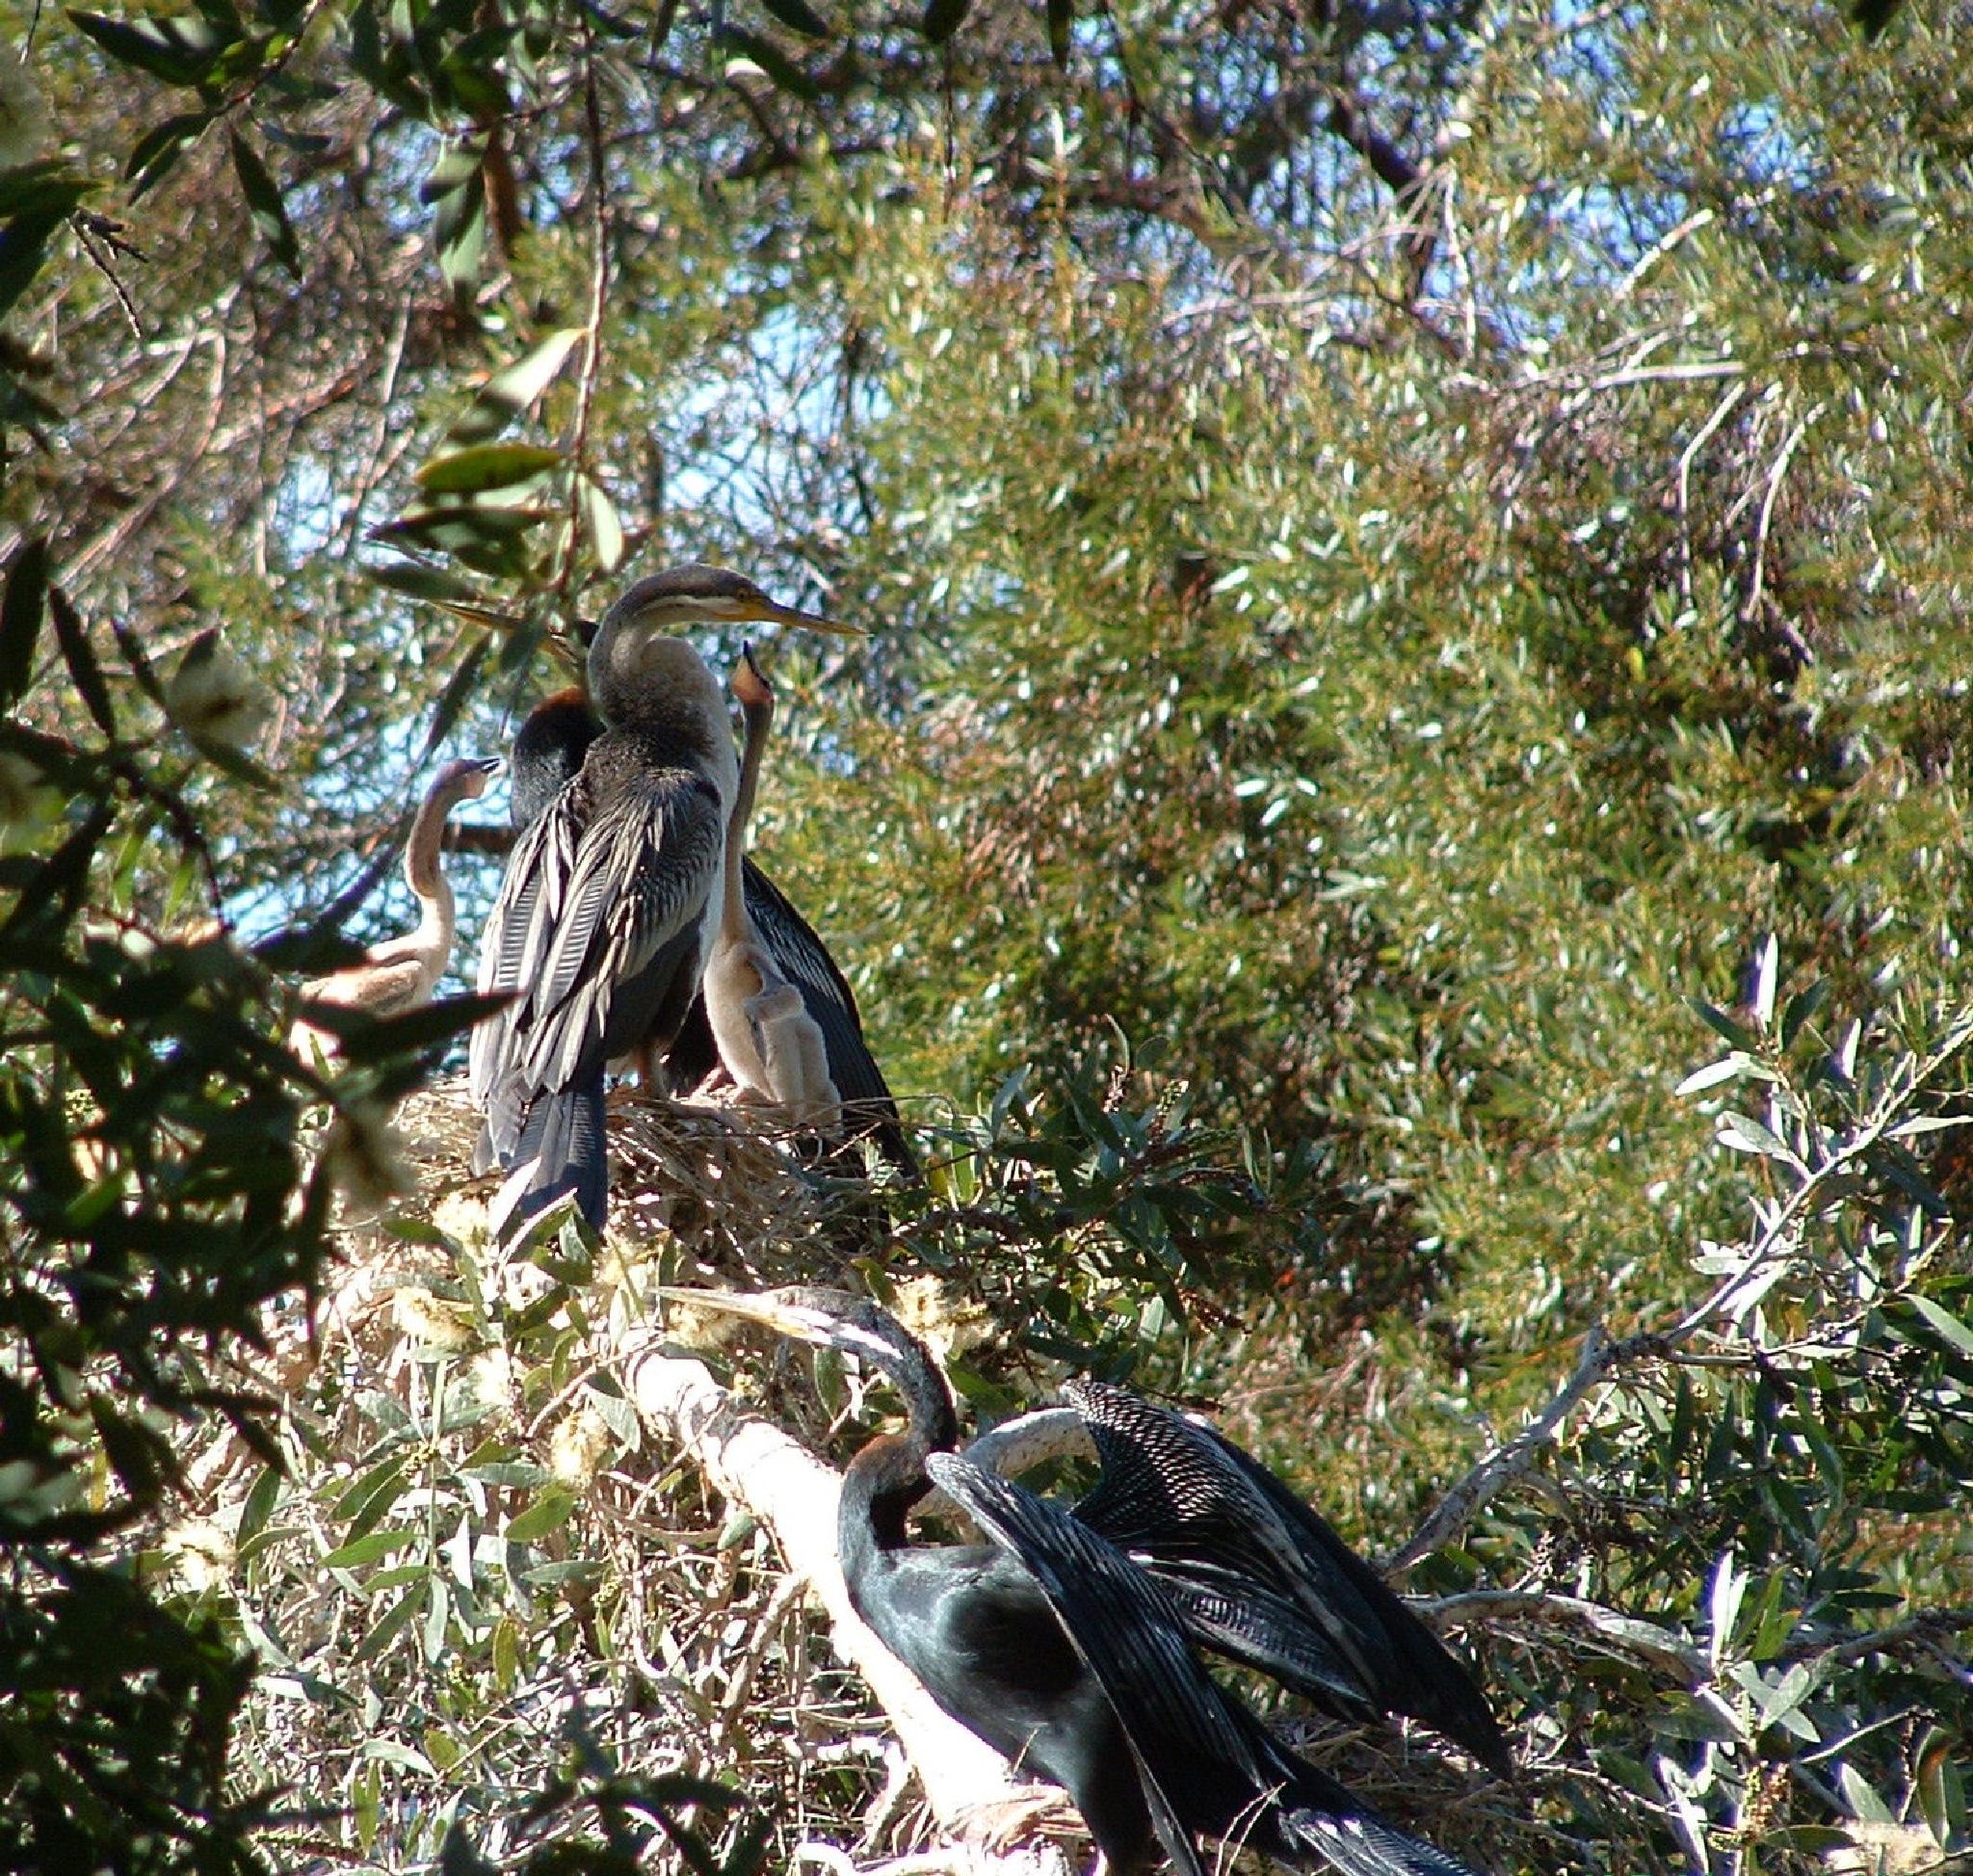 Australian Darter Family by Zoid359WA